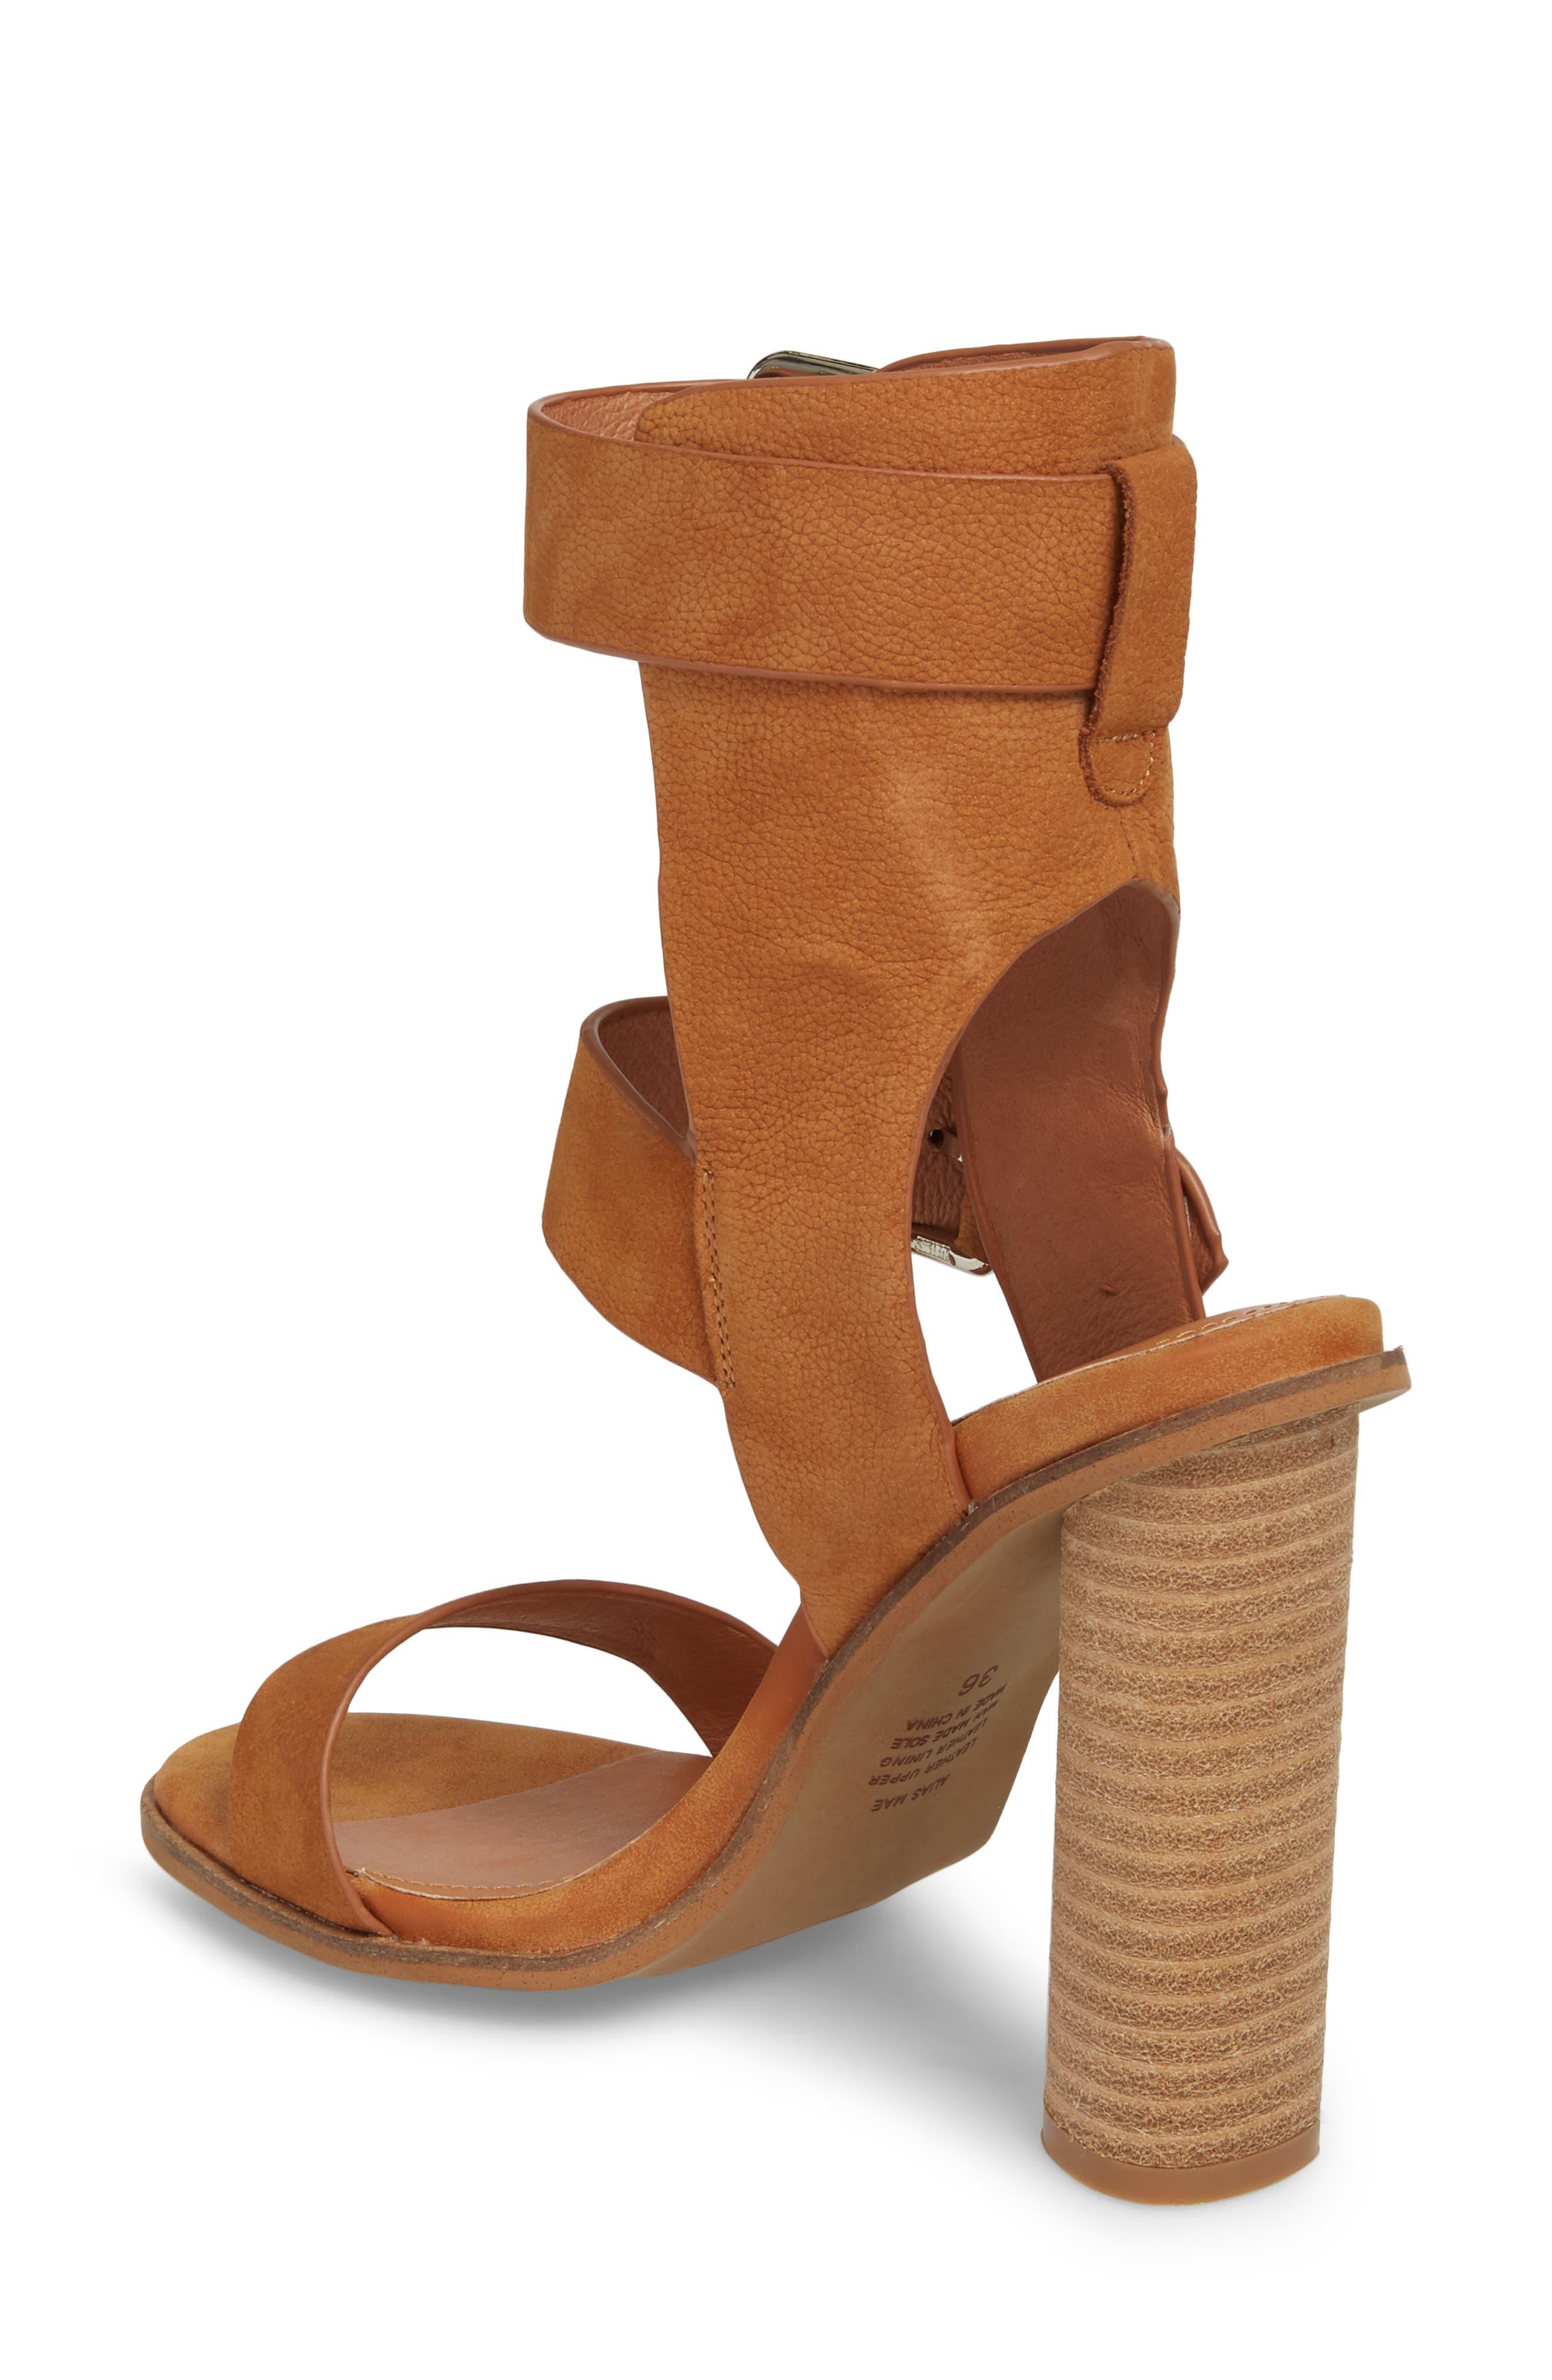 Abeba Block Heel Sandal,                             Alternate thumbnail 2, color,                             Tan Leather